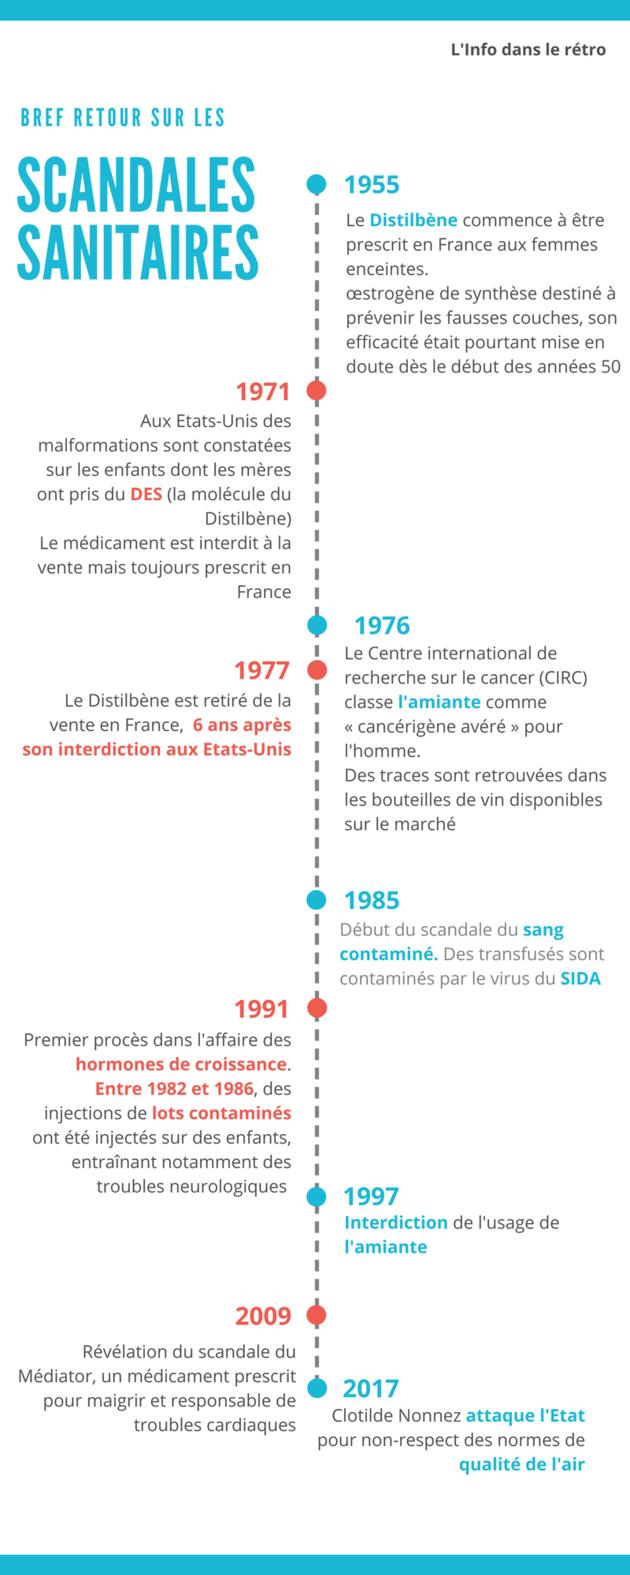 les_scandales_sanitaires.png